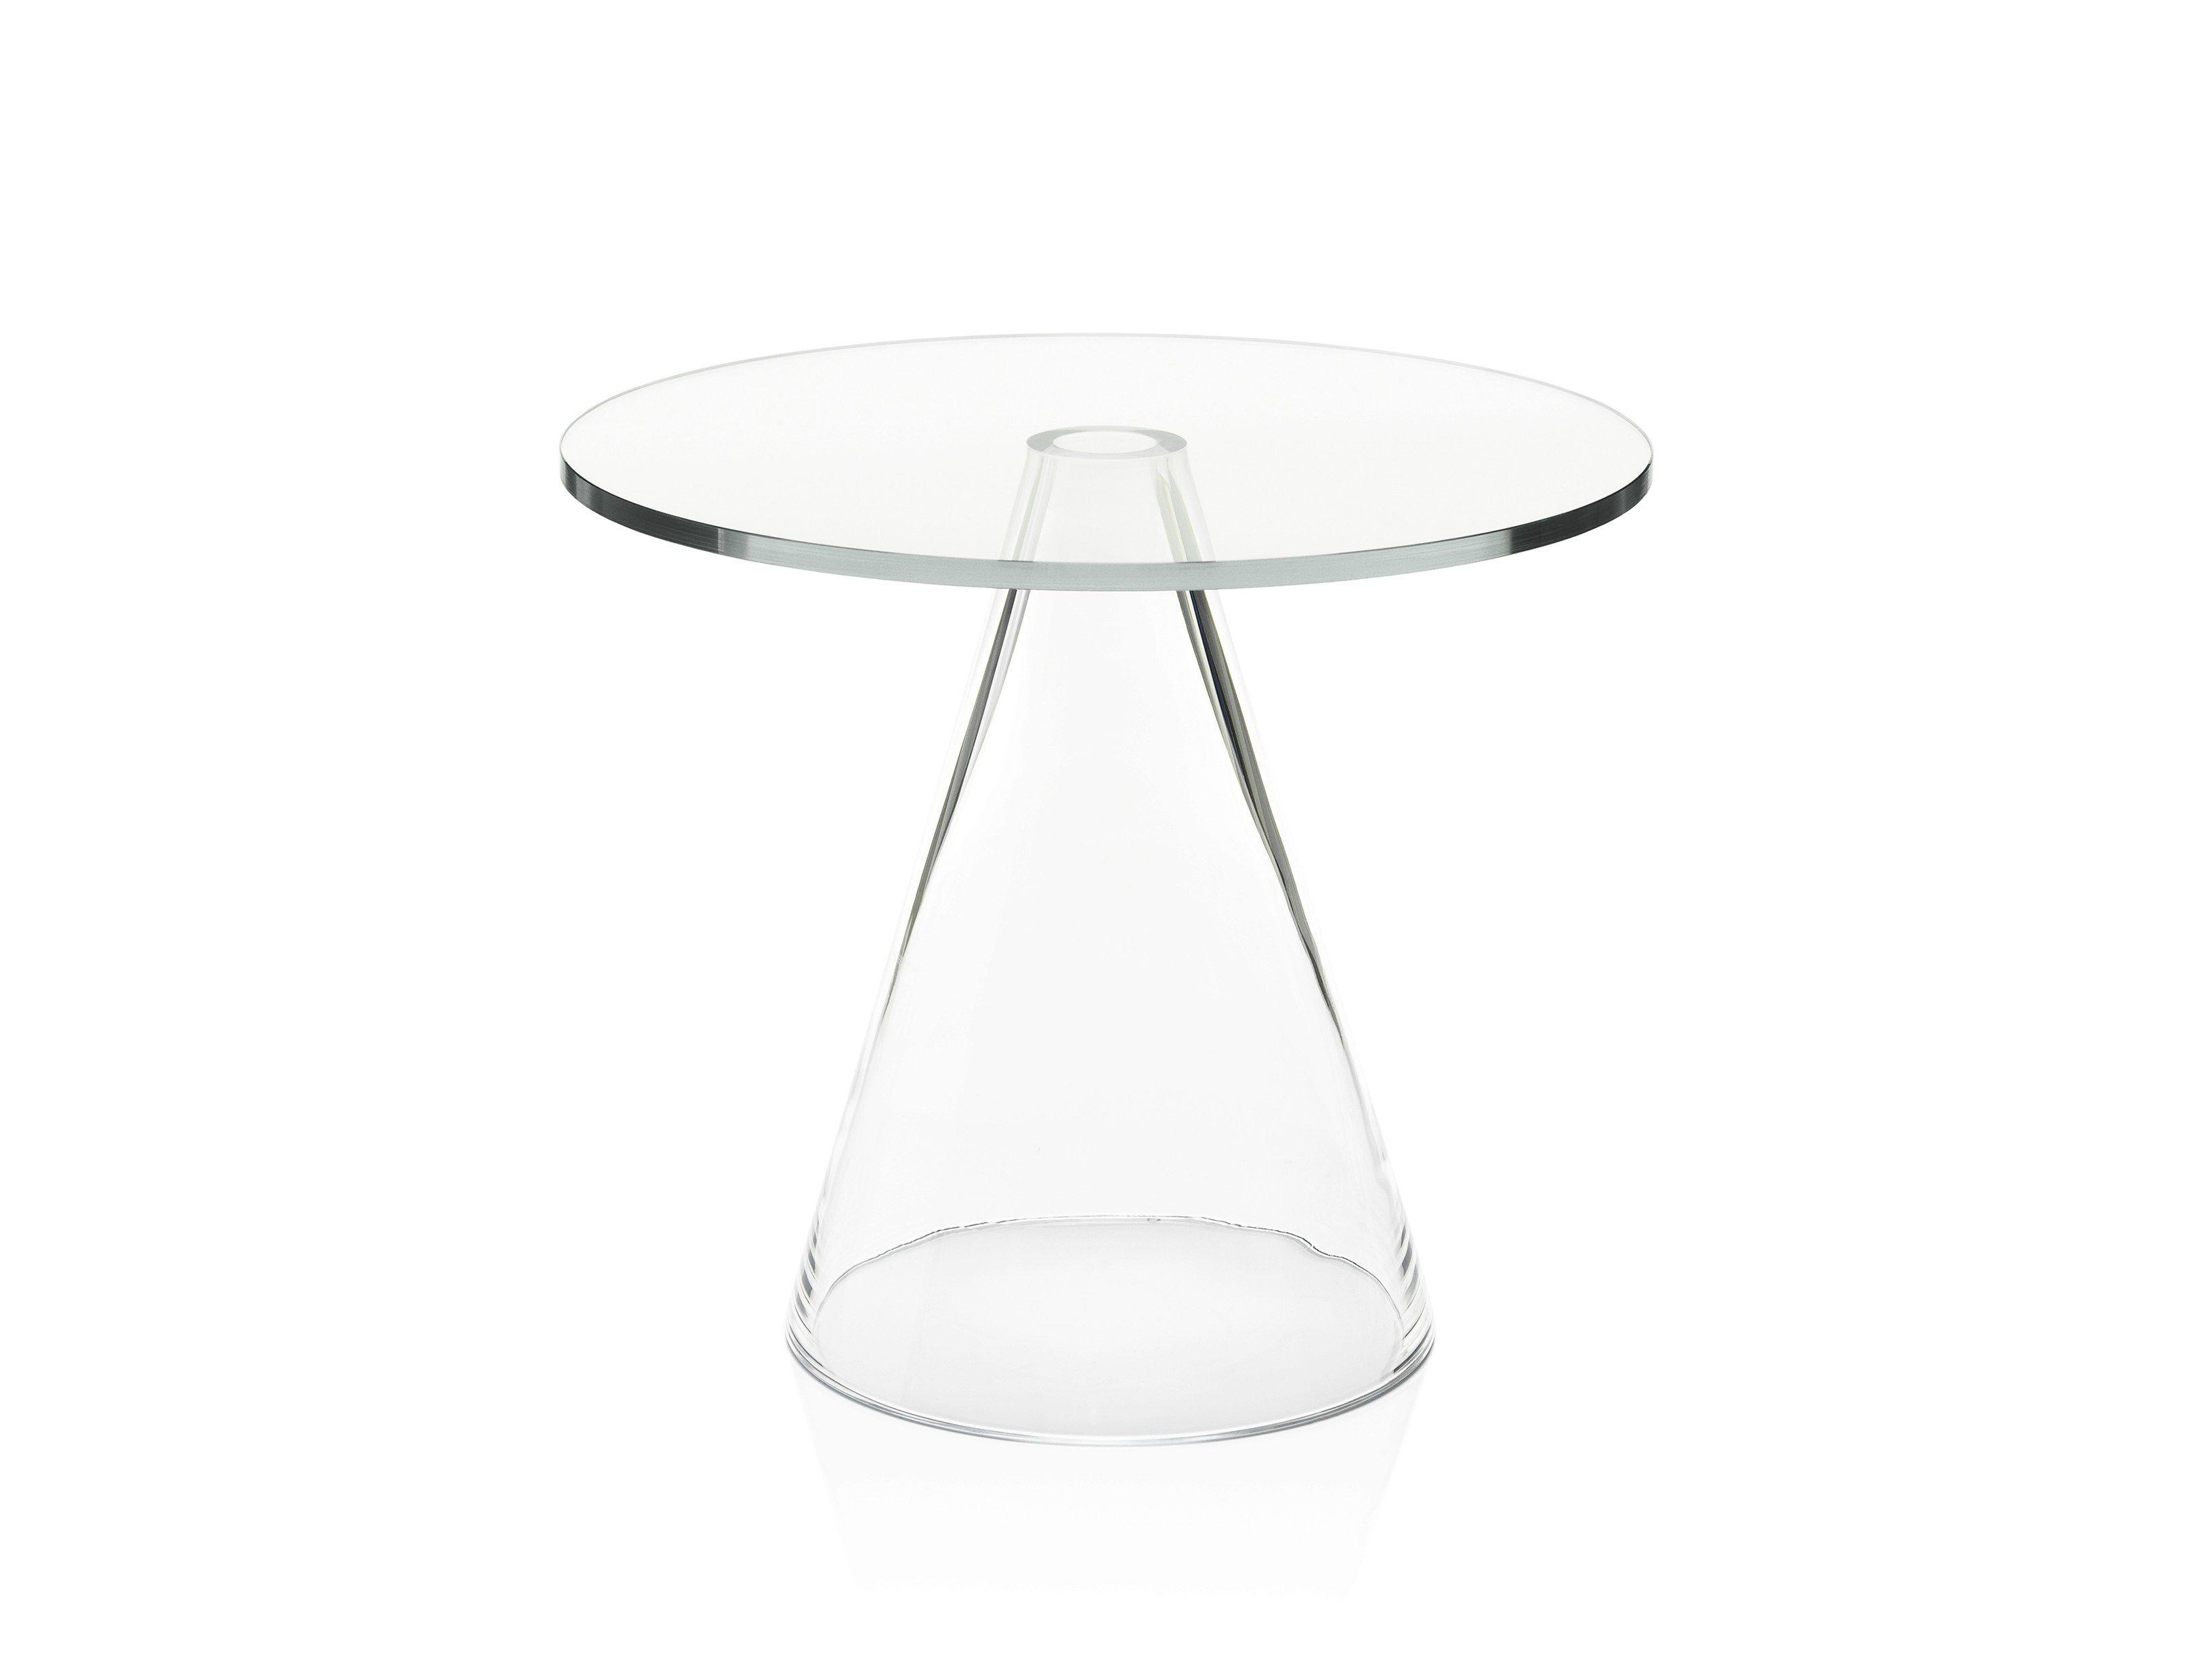 Tavolini ikea tavolini da soggiorno ikea luxury tavolini for Ikea tavolini da esterno